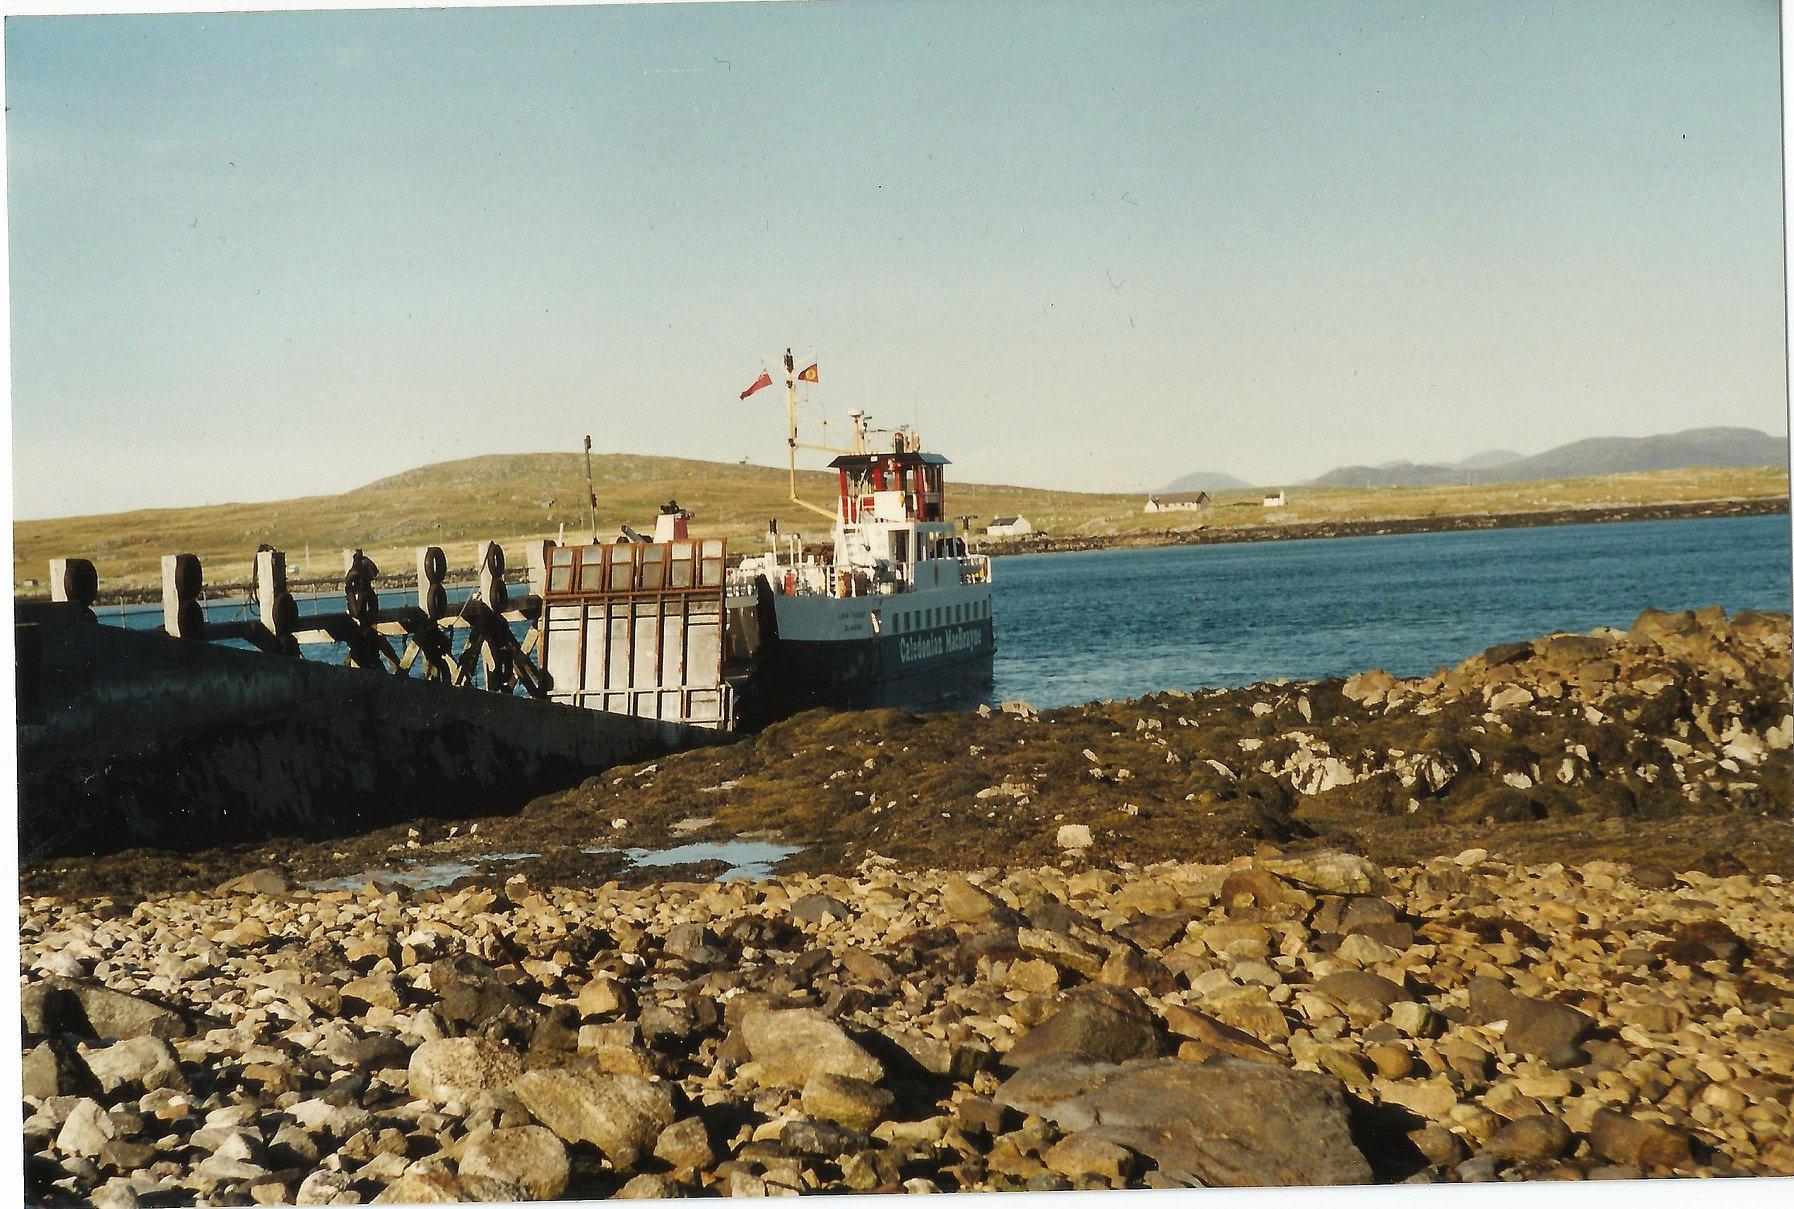 Loch Tarbert relieving at Otternish (Iain McPherson)